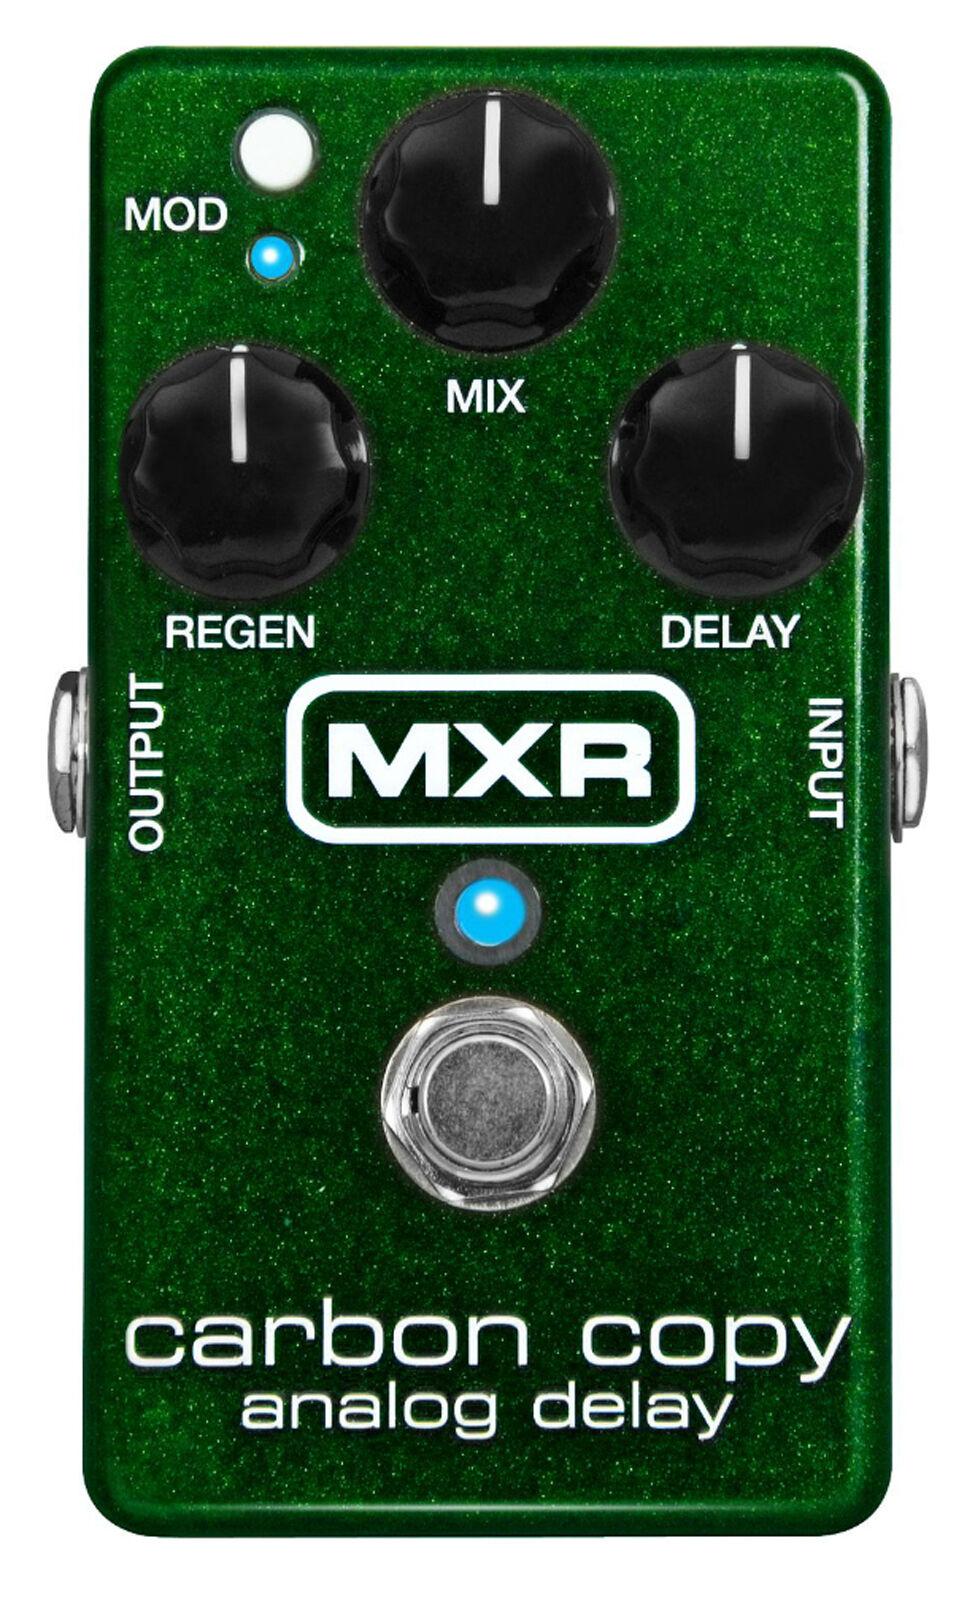 MXR Carbon Copy Analog Delay M169 Effects Pedal Dunlop M 169